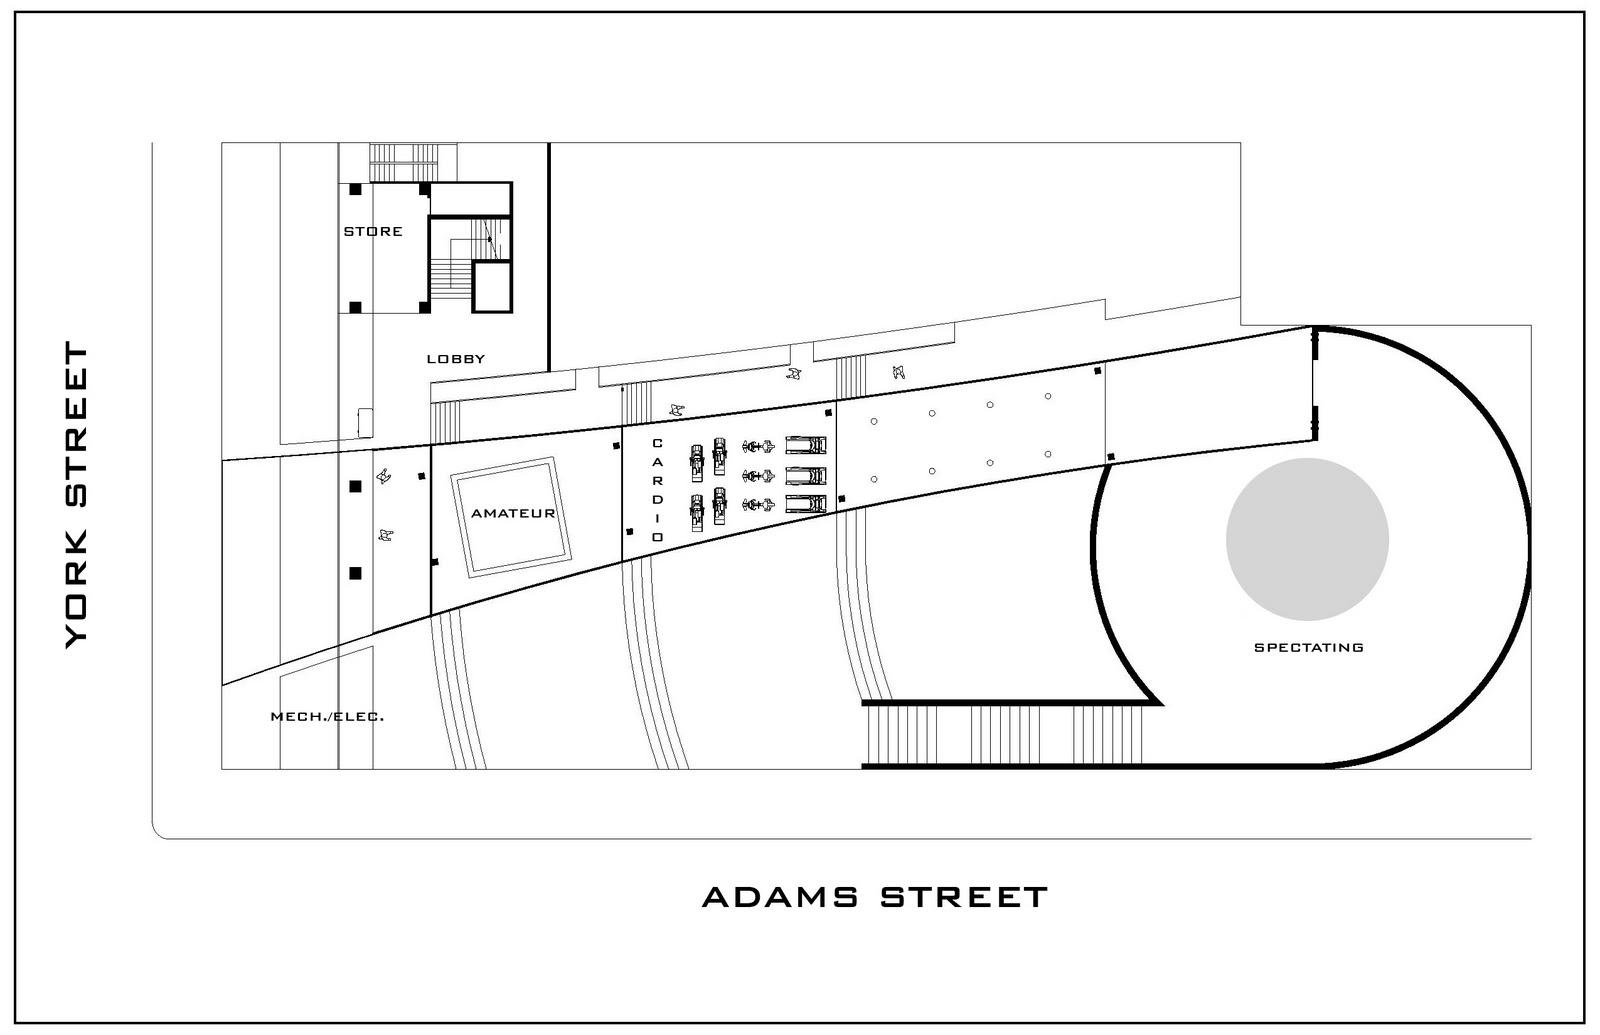 Jr villegas com gym plans for Gym blueprints